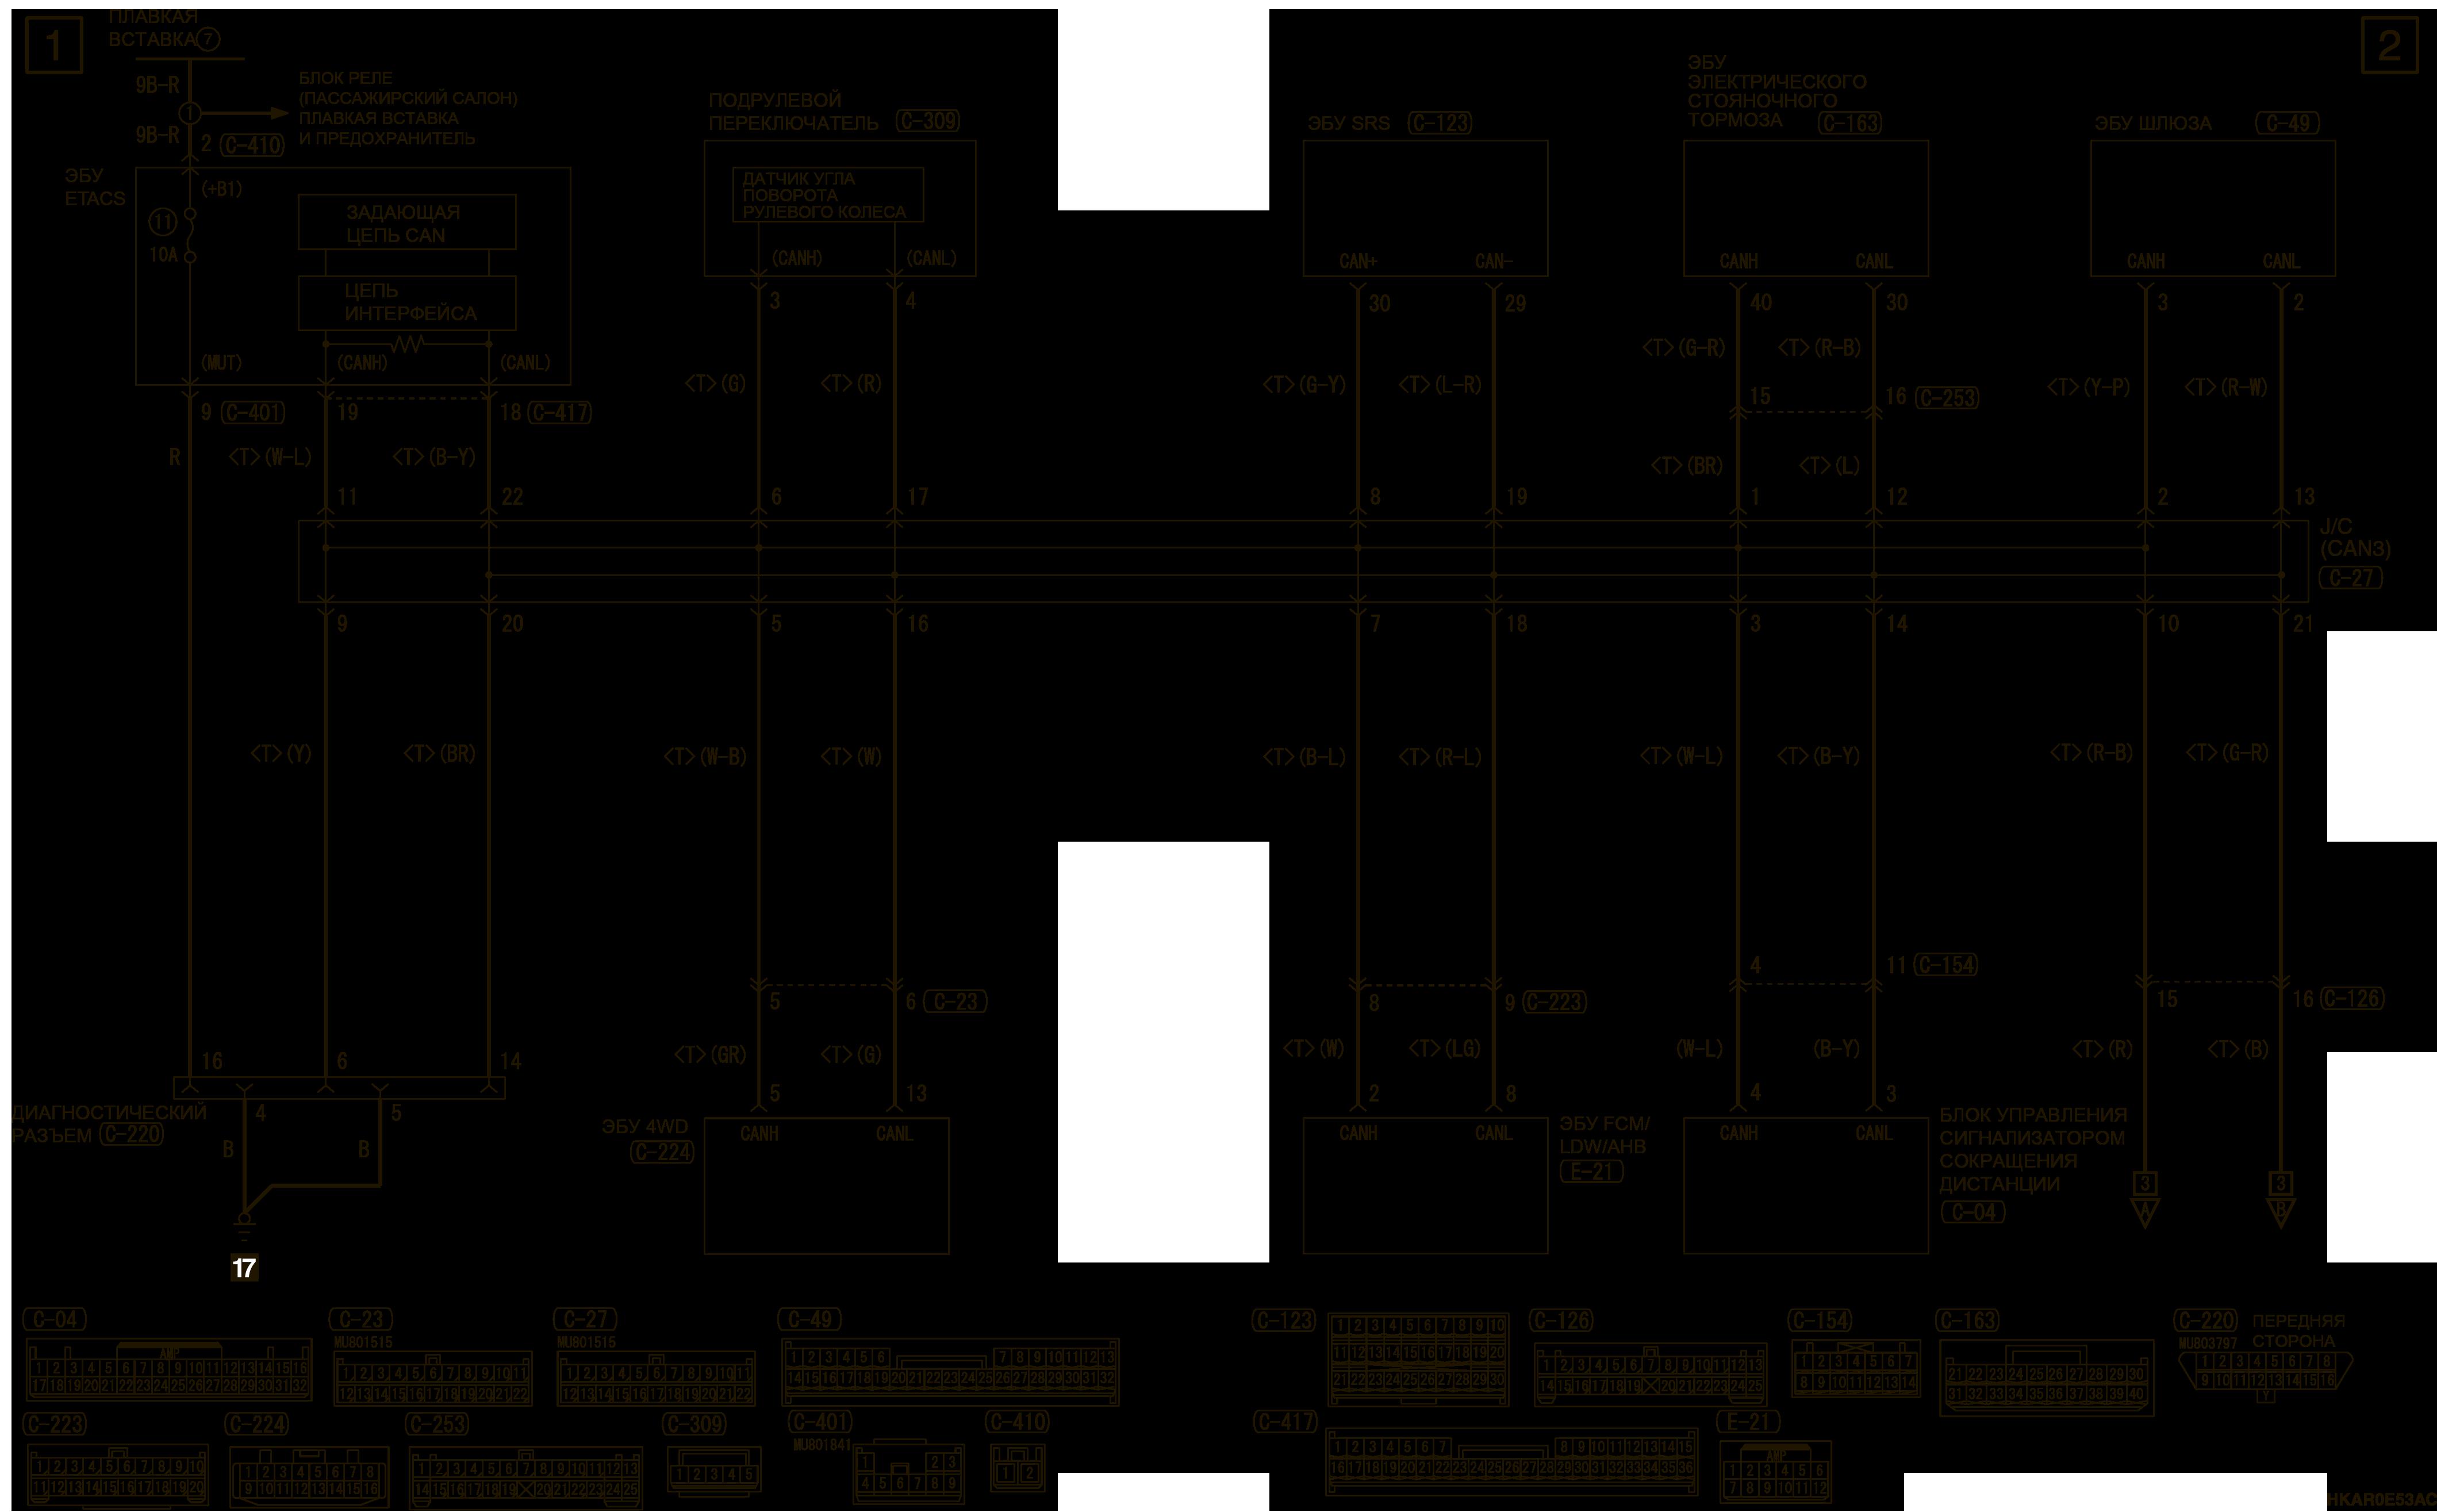 mmc аутлендер 3 2019 электросхемаCAN Слева